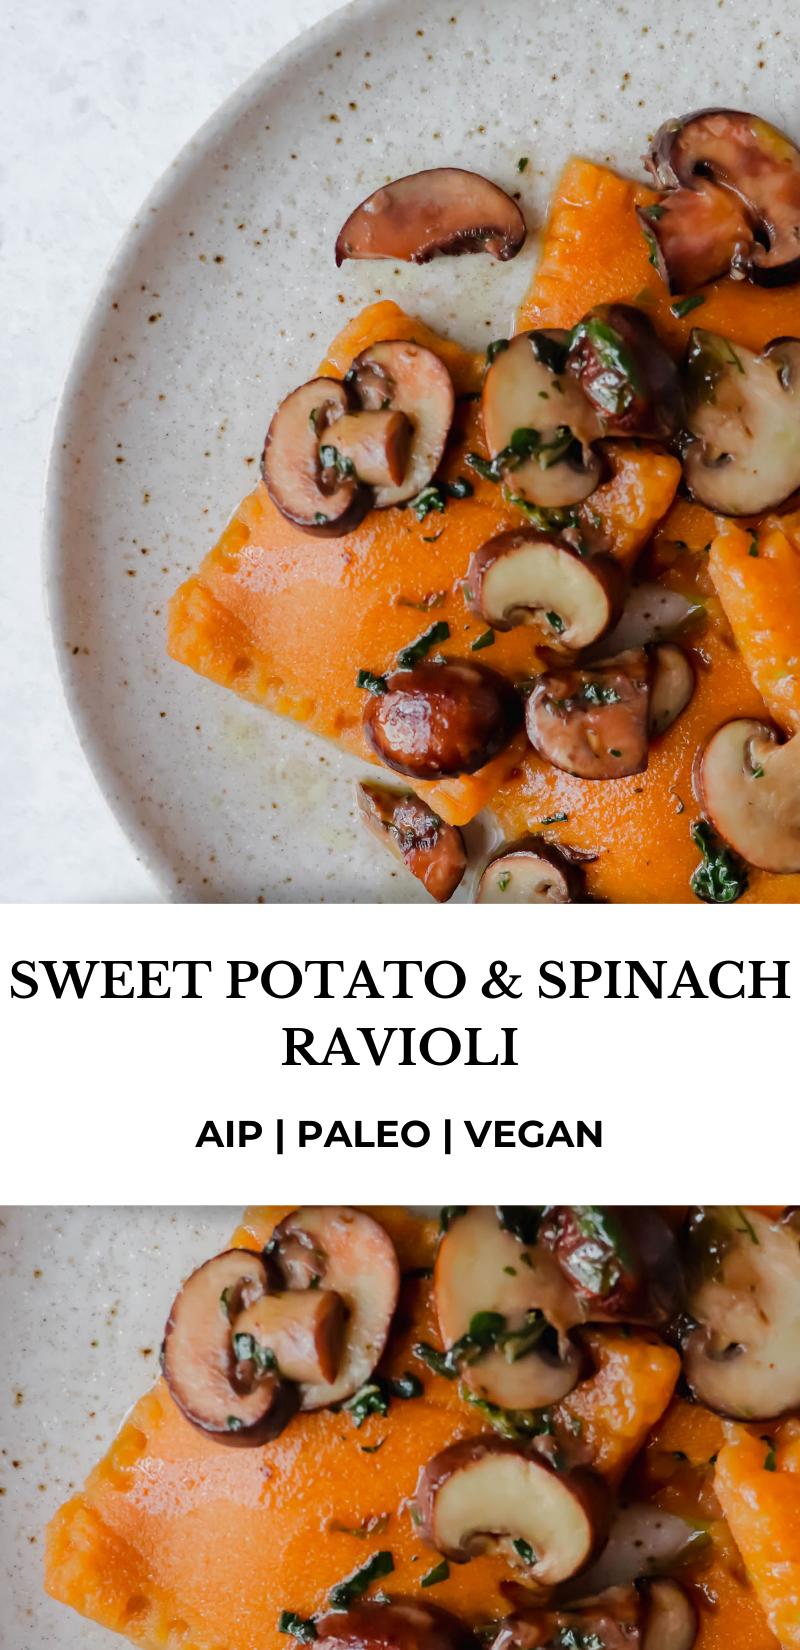 Sweet Potato And Spinach Ravioli Heal Me Delicious Recipe Aip Paleo Recipes Autoimmune Paleo Recipes Aip Diet Recipes